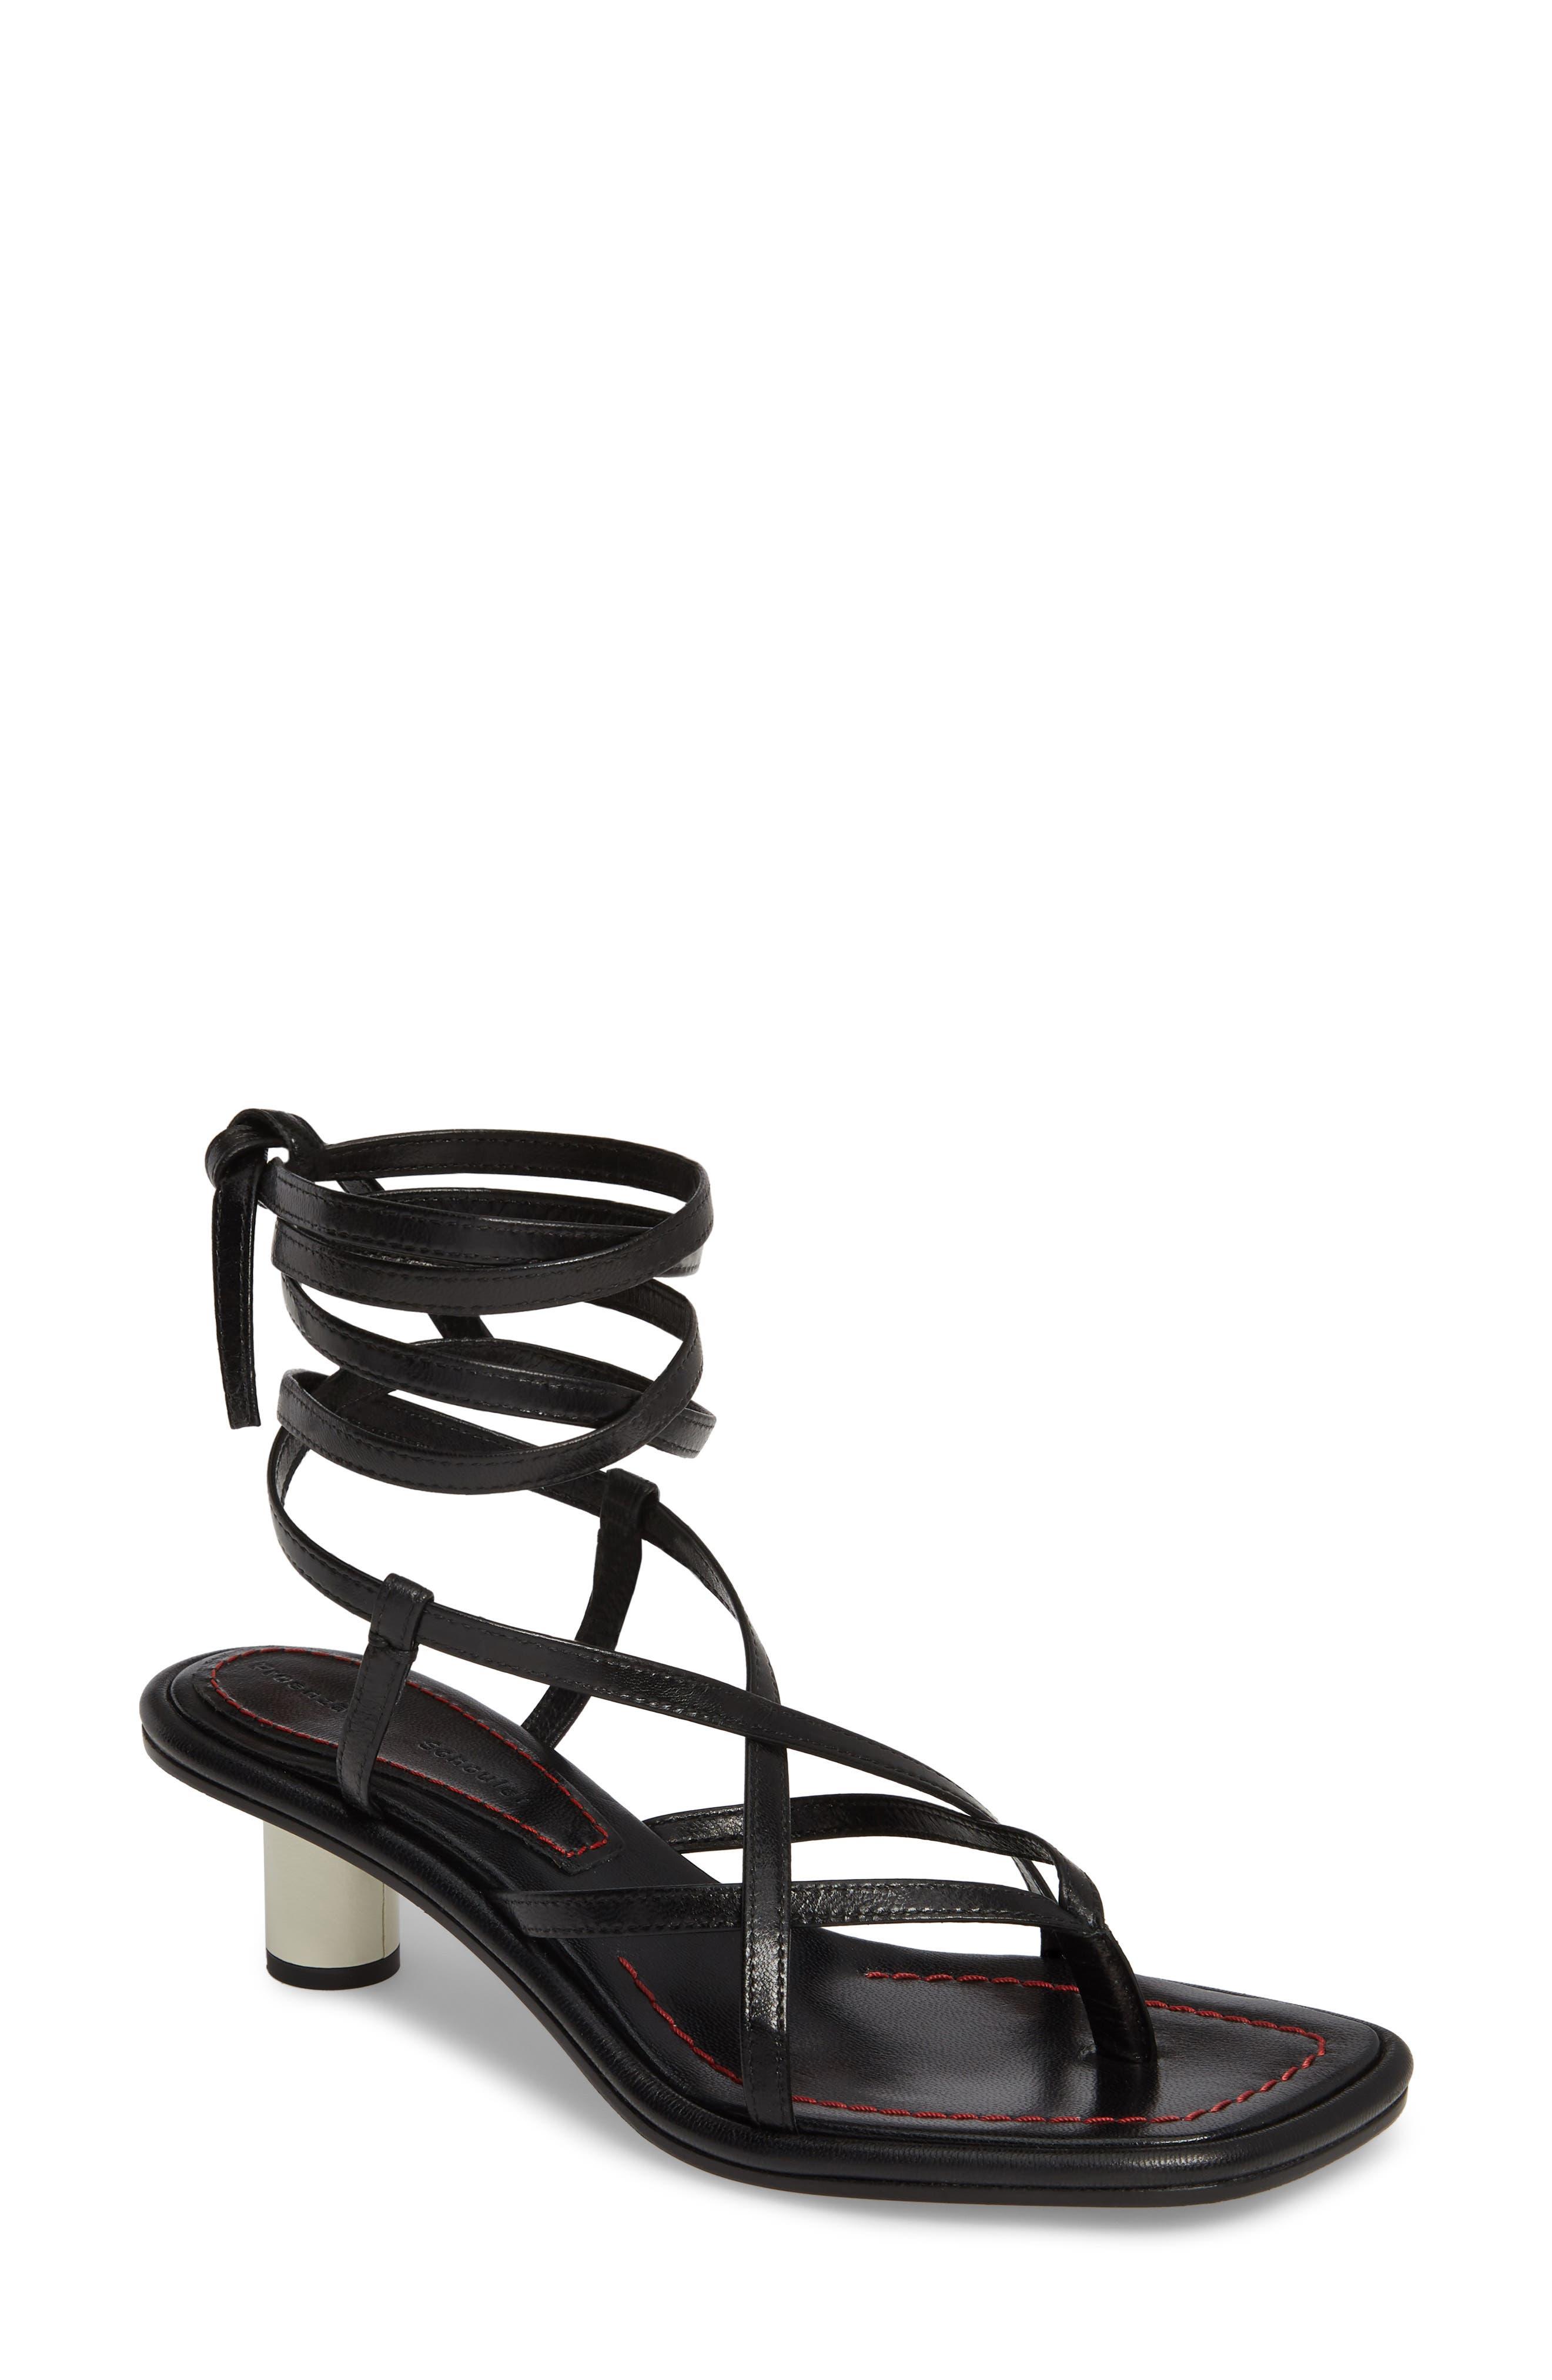 PROENZA SCHOULER Wraparound Ankle Strap Sandal, Main, color, BLACK